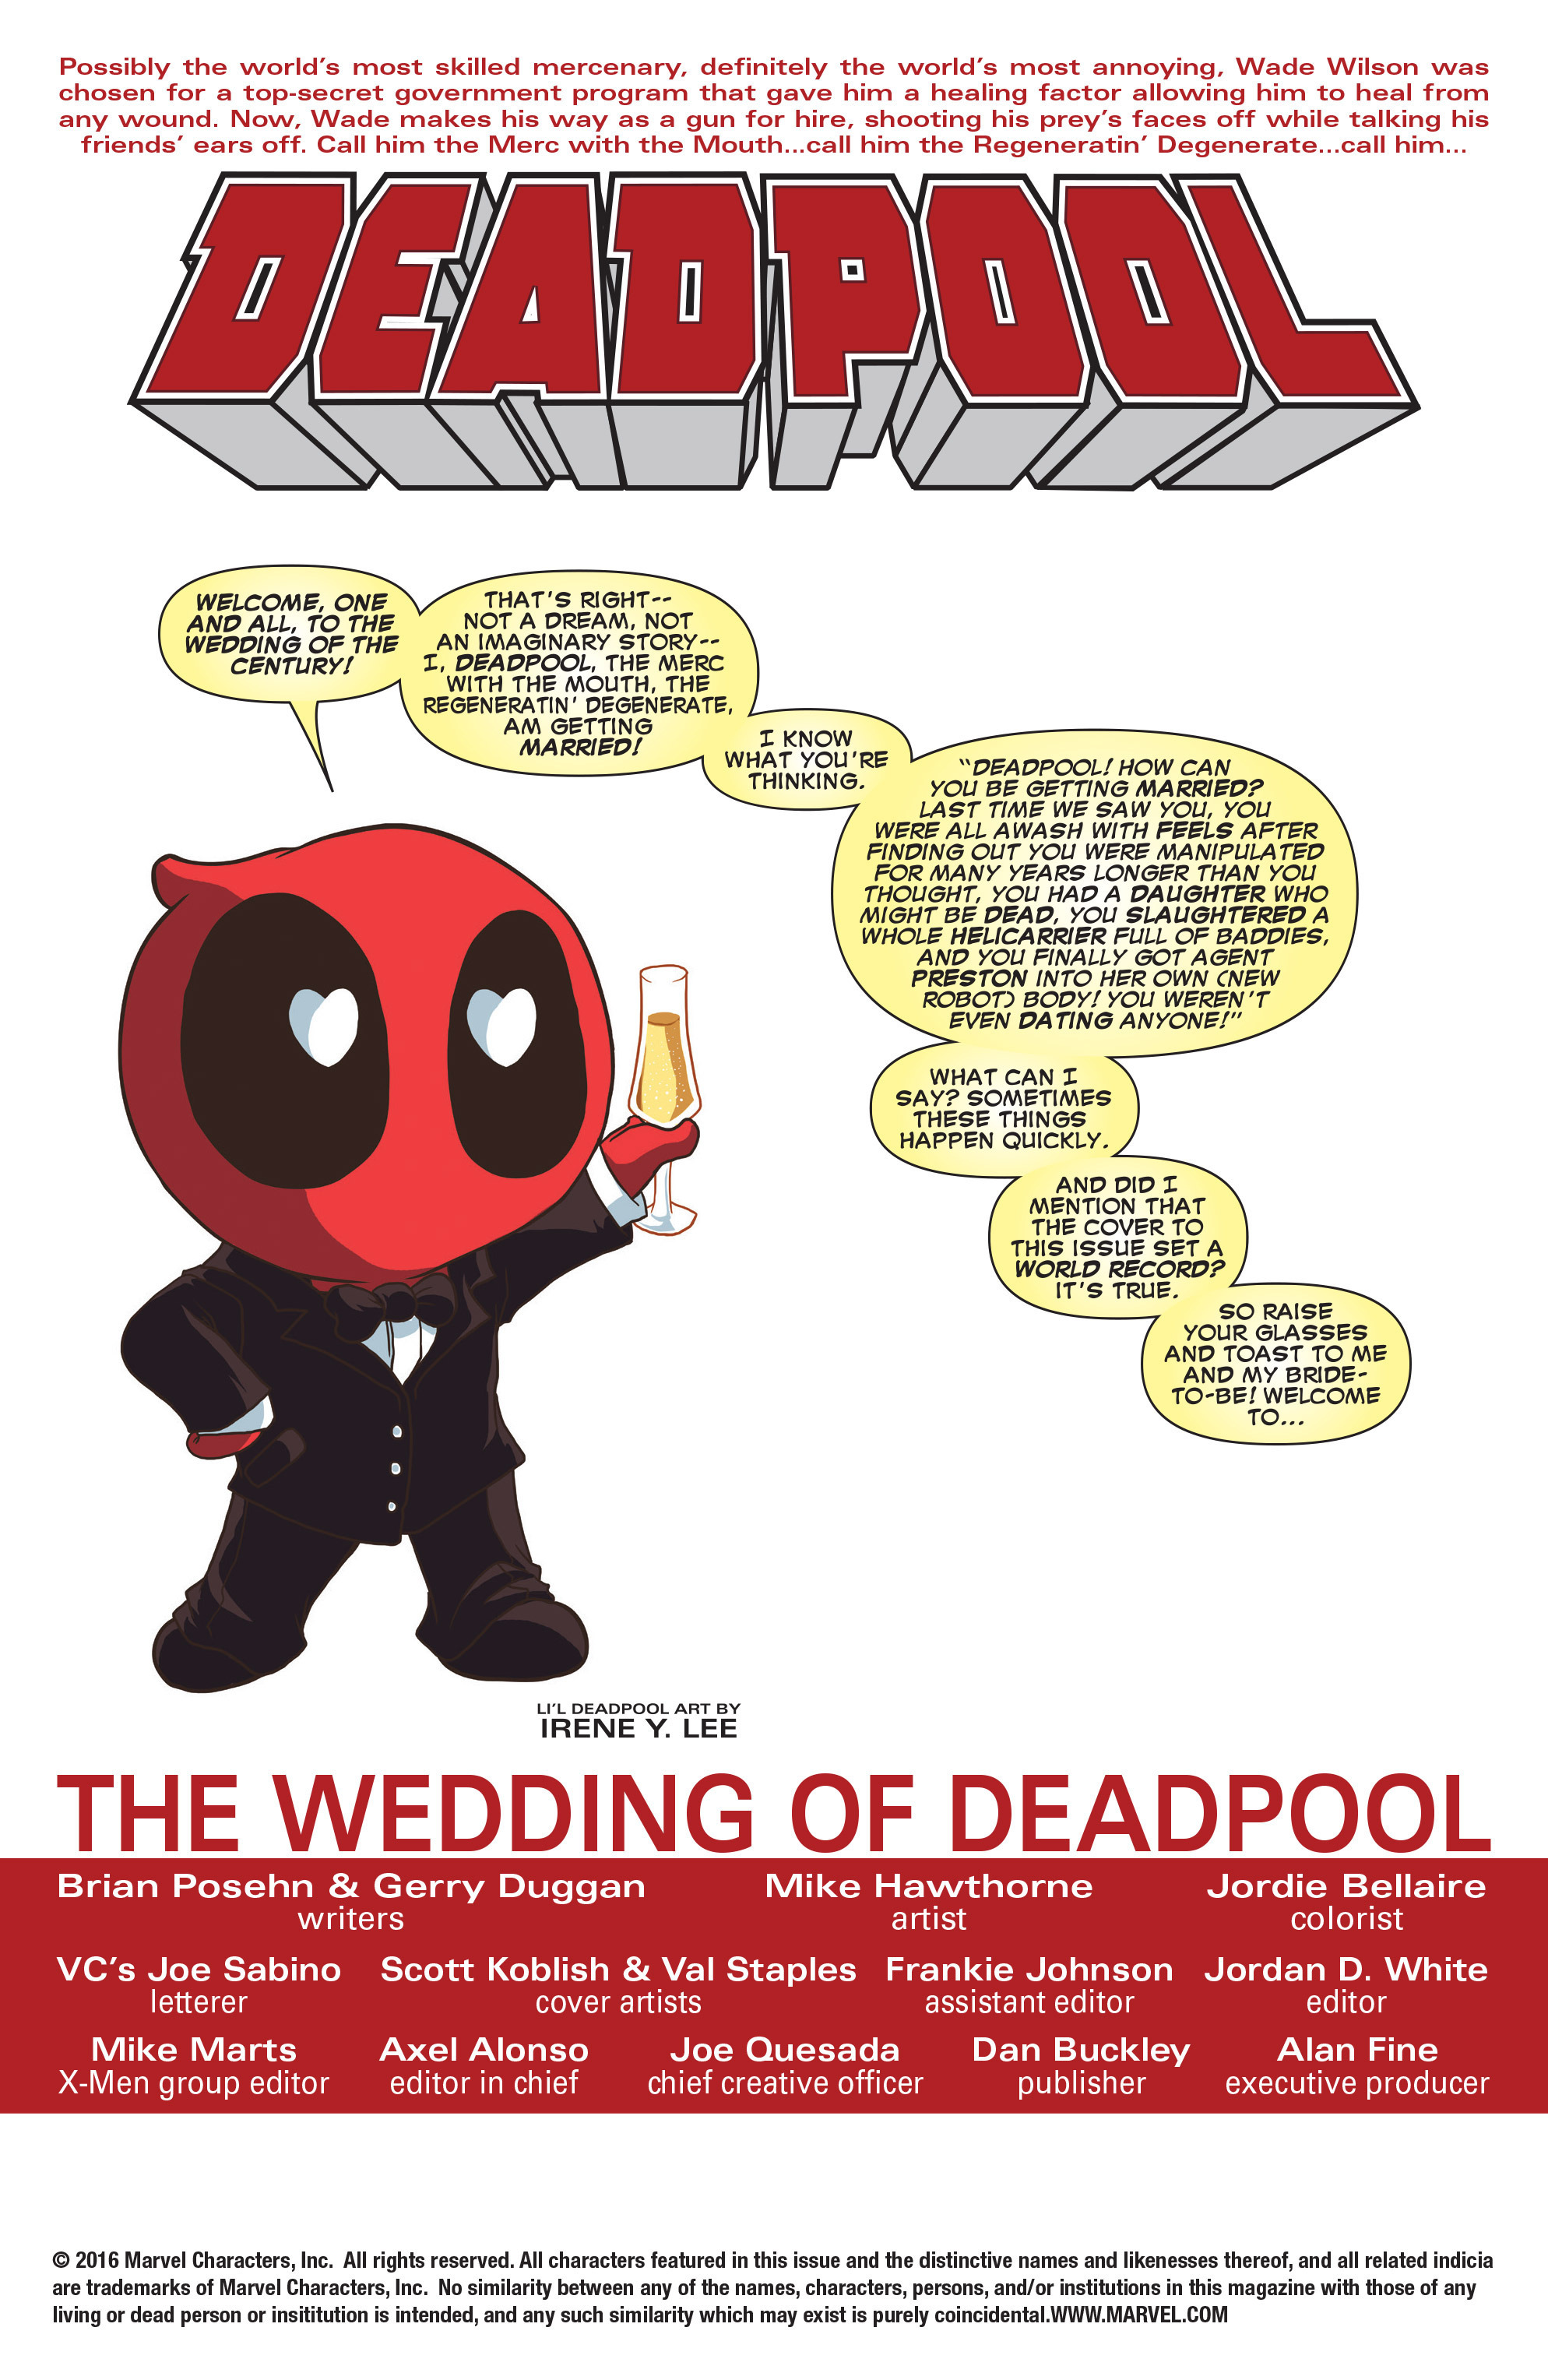 Read online True Believers: The Wedding of Deadpool comic -  Issue # Full - 3